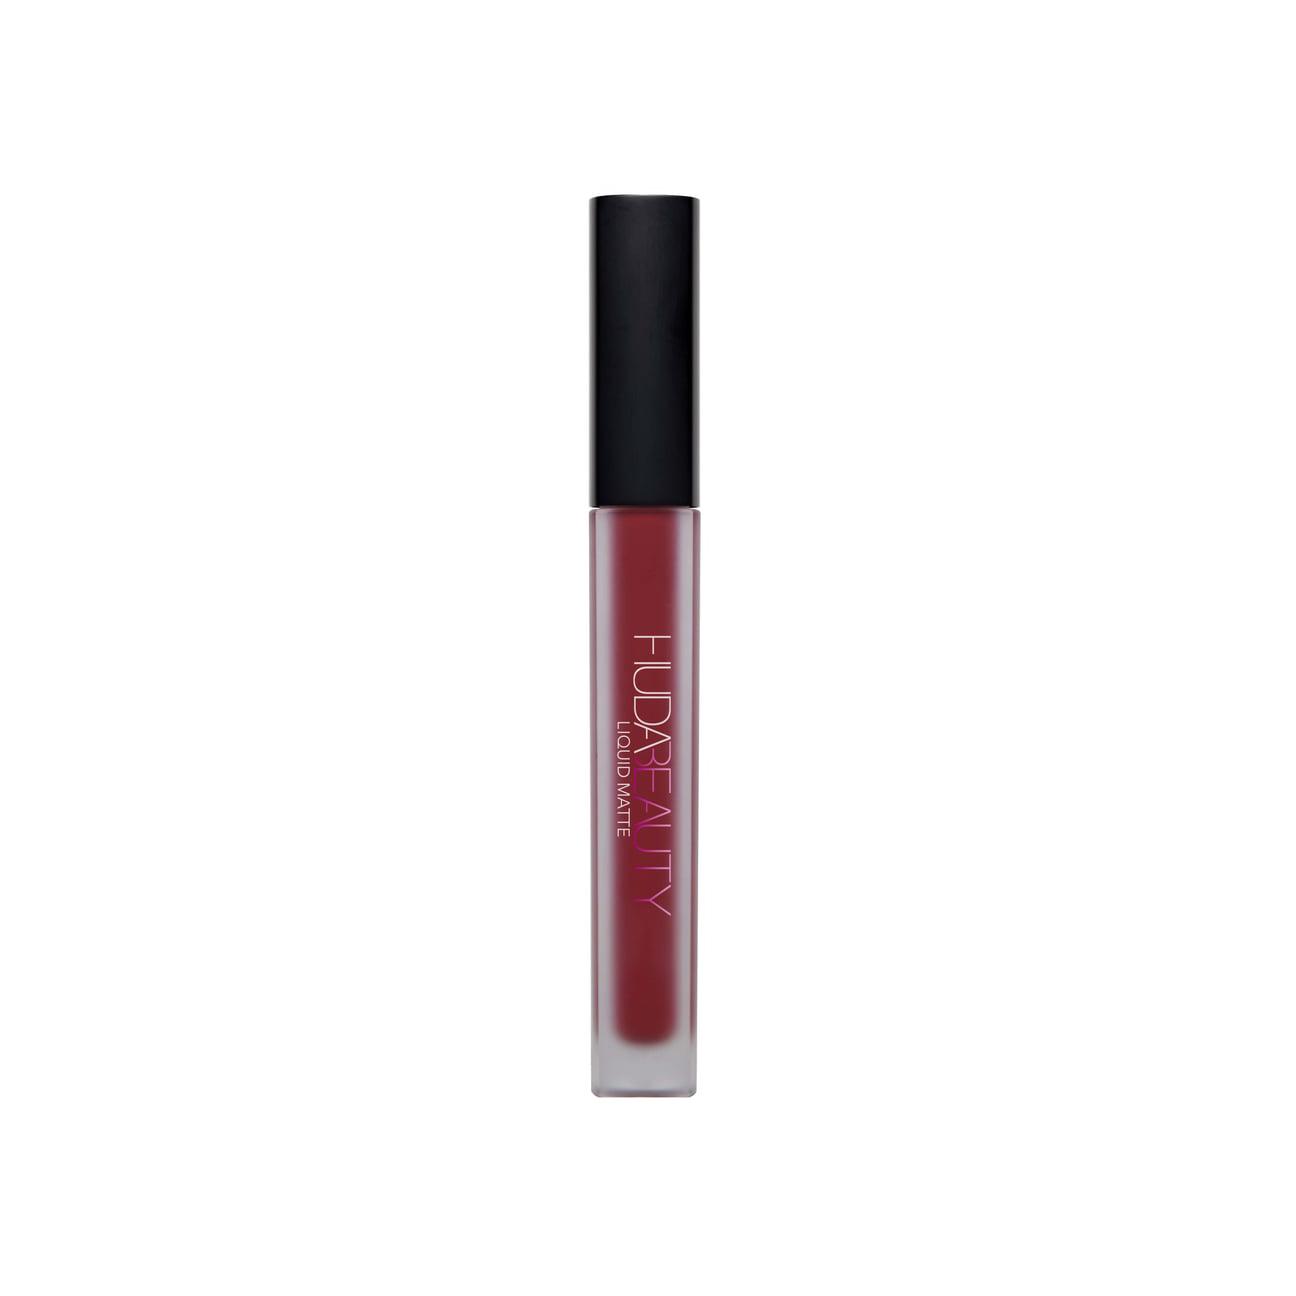 Huda Beauty Liquid Matte Lipstick in Cheerleader